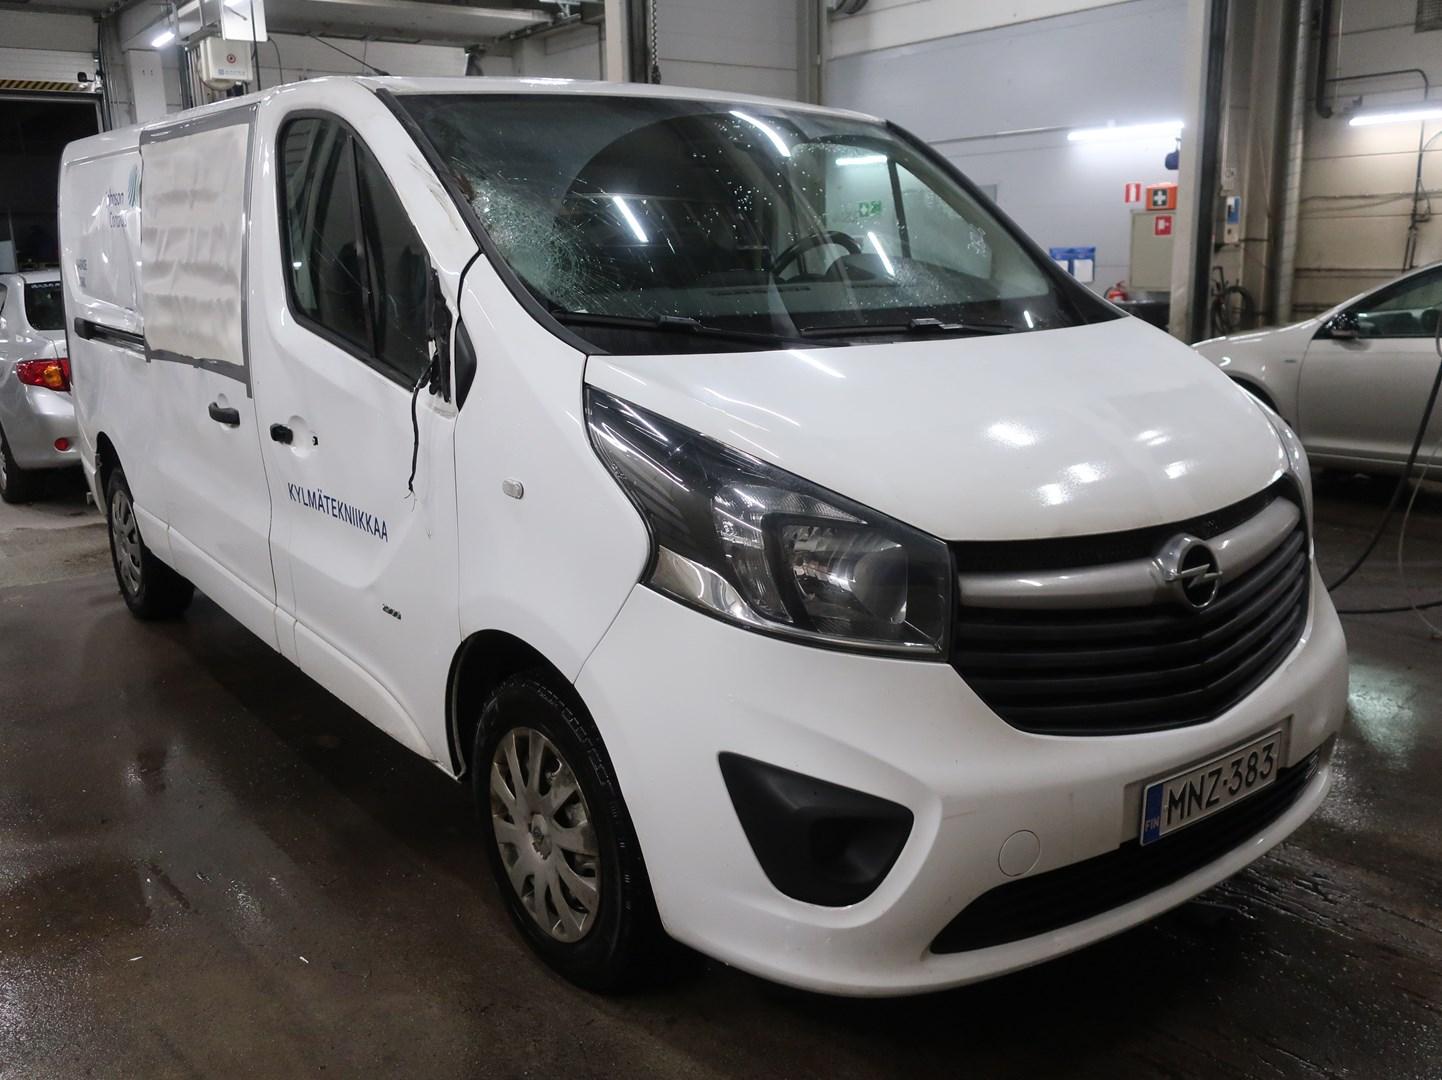 2016 Opel Vivaro For Sale At Espoo On Tuesday February 04 2020